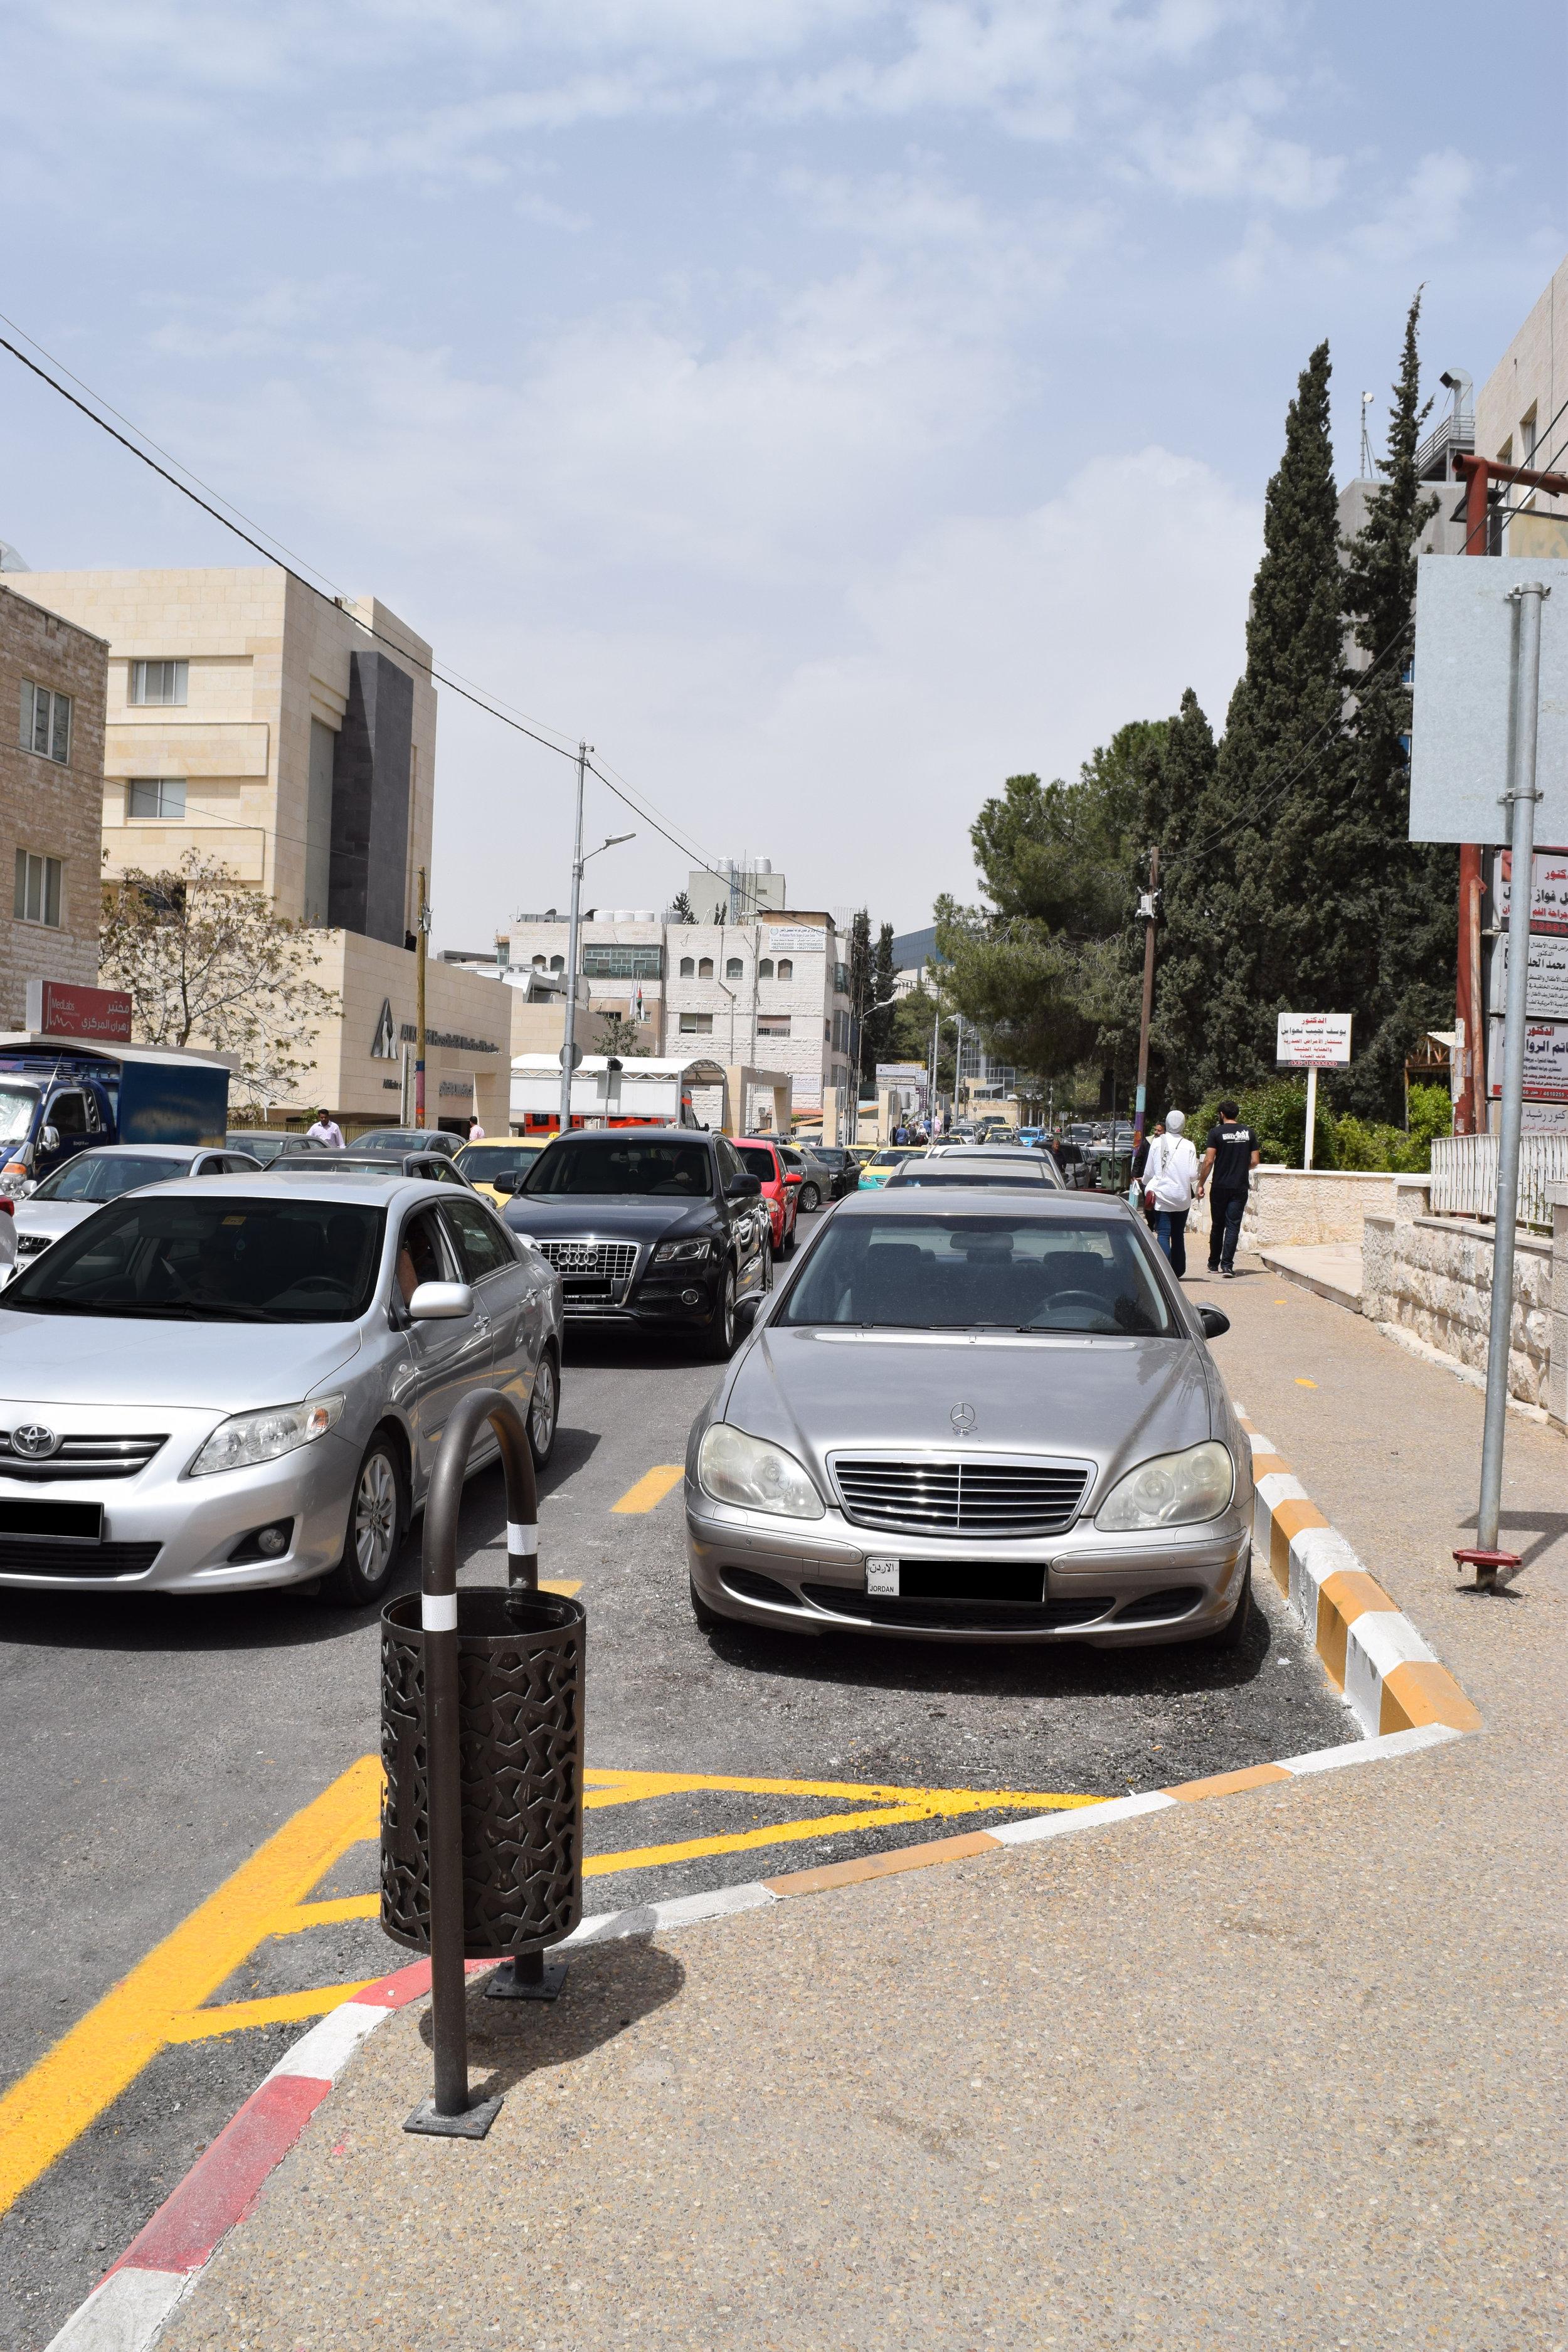 An off-set street-side parking area.